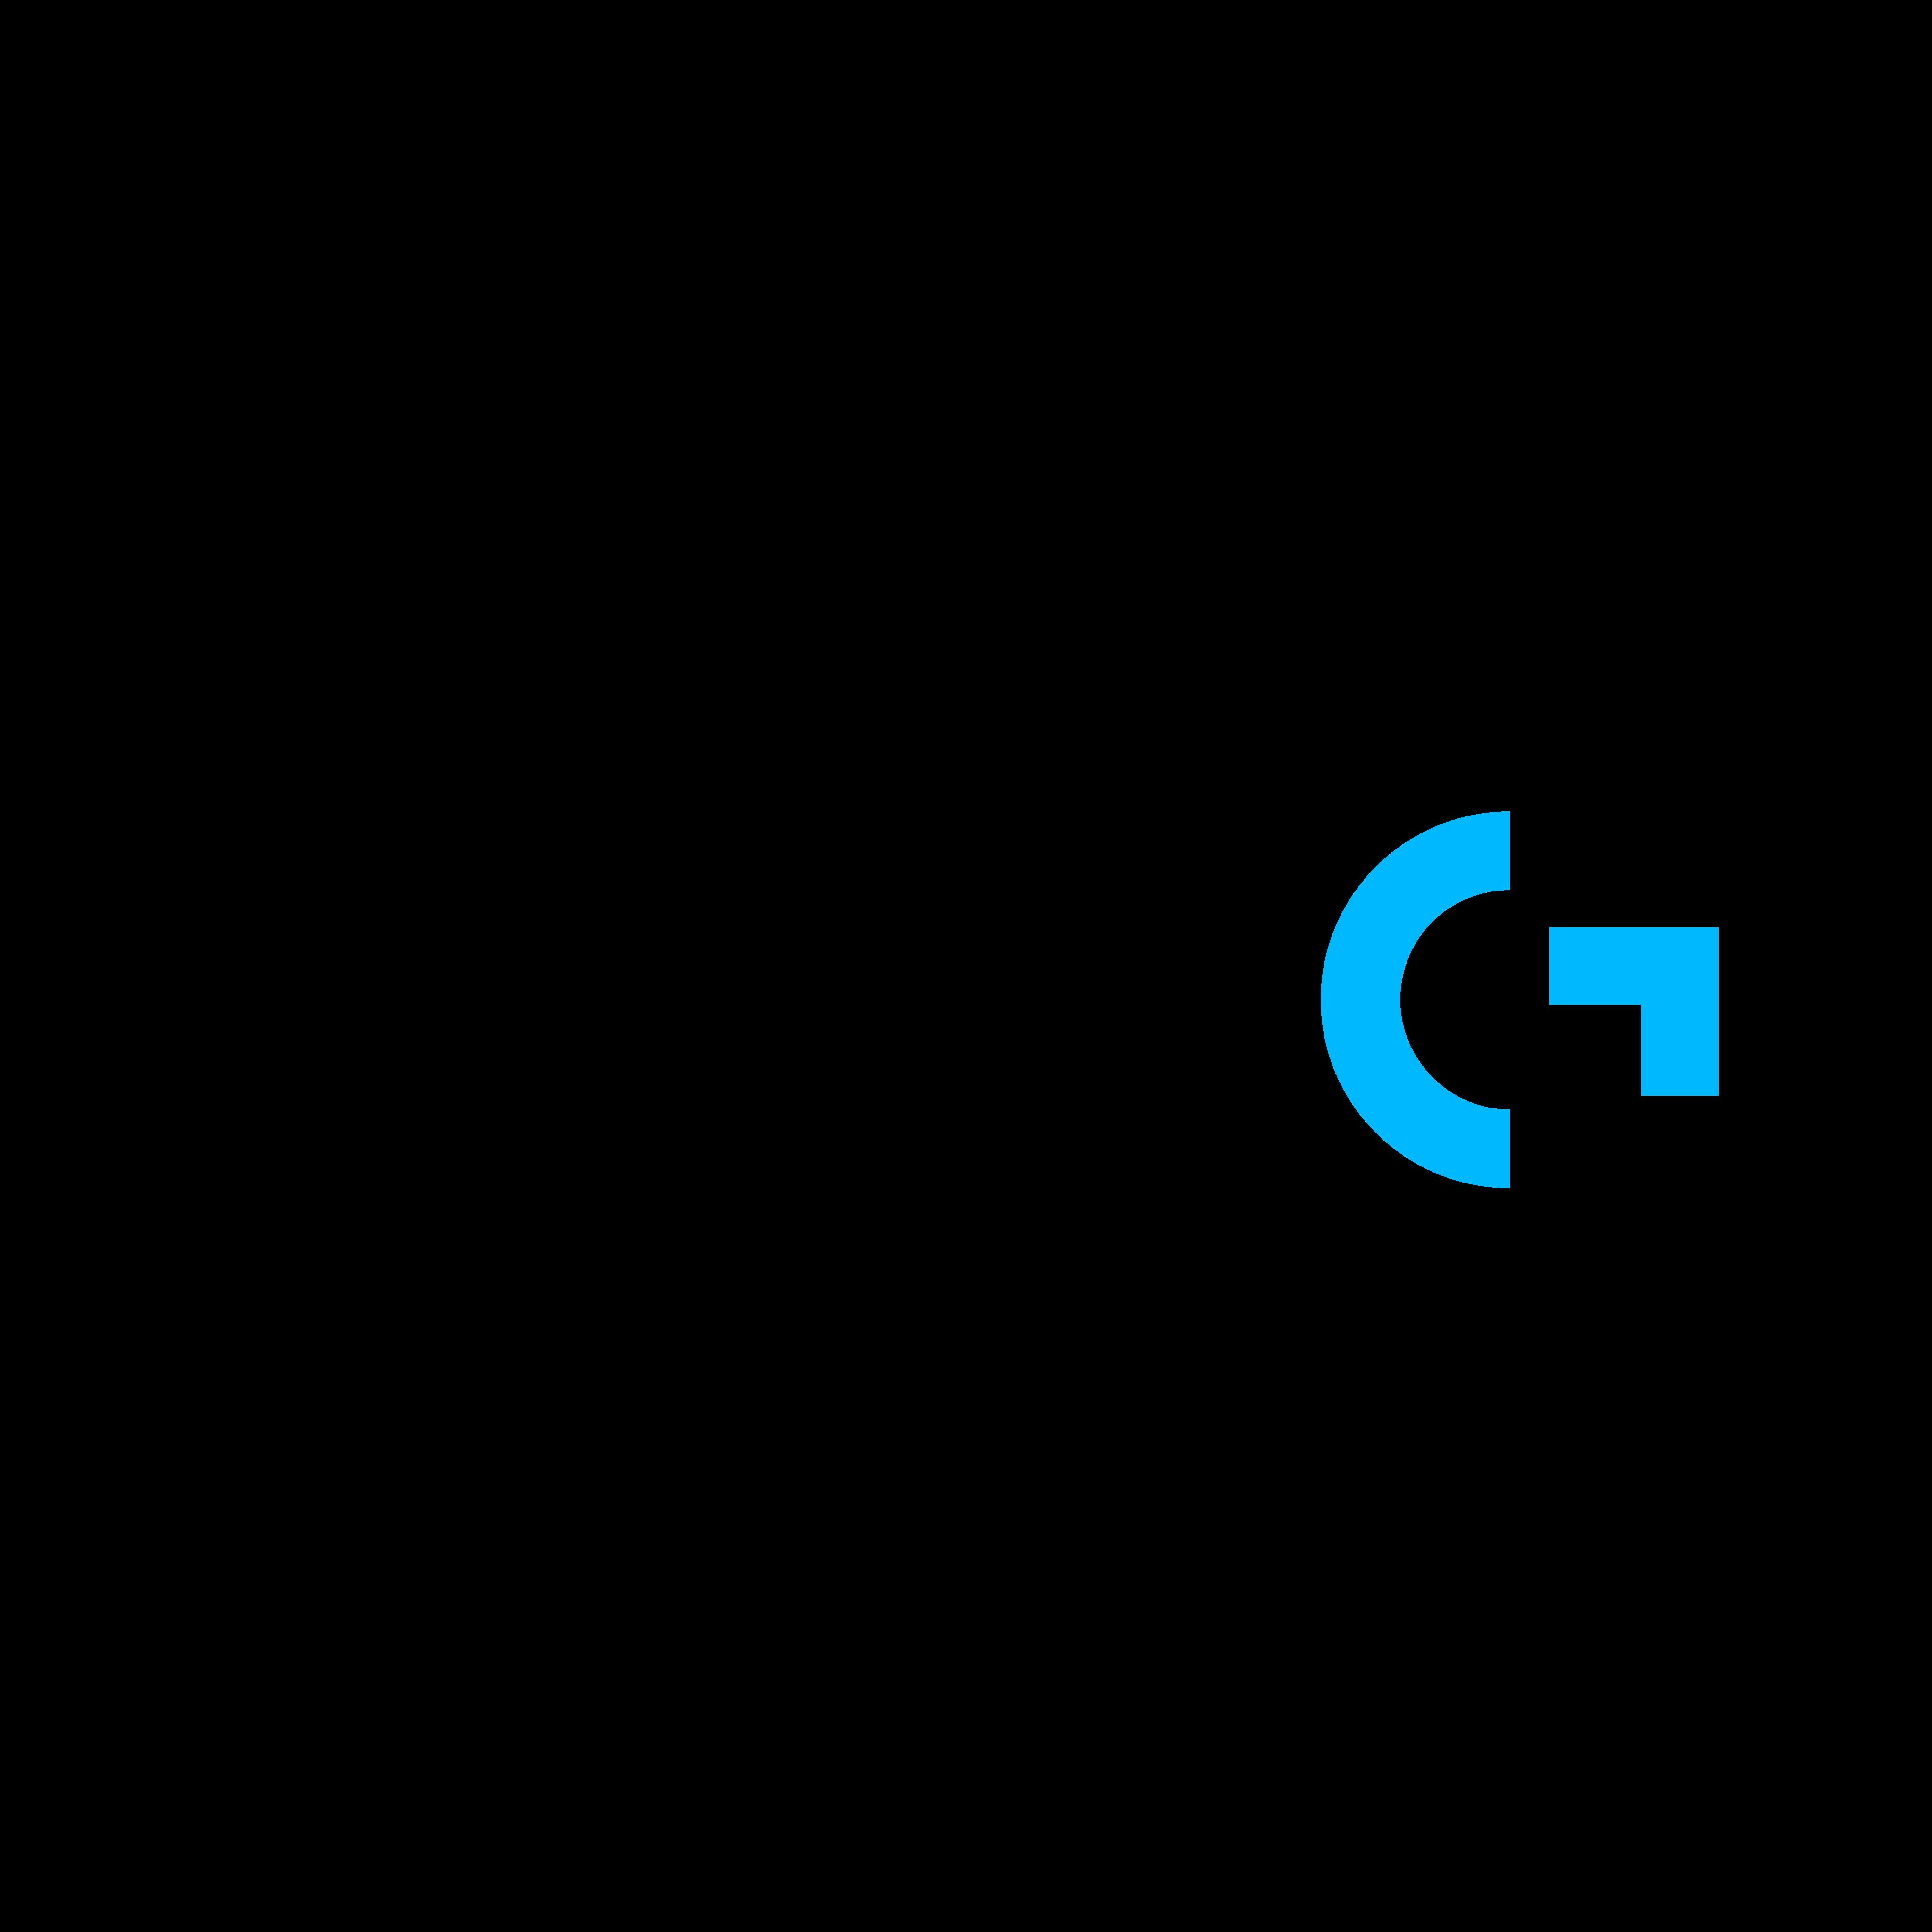 logitech logo 01 - Logitech Logo